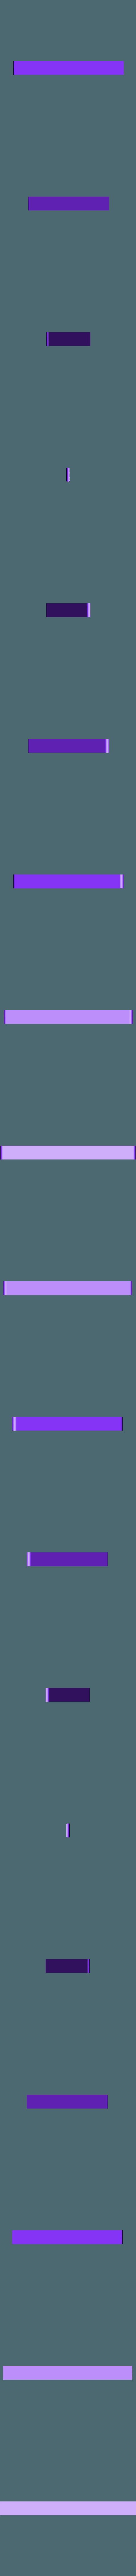 Connecteur10.stl Download free STL file Modular reminder • 3D print template, rfbat